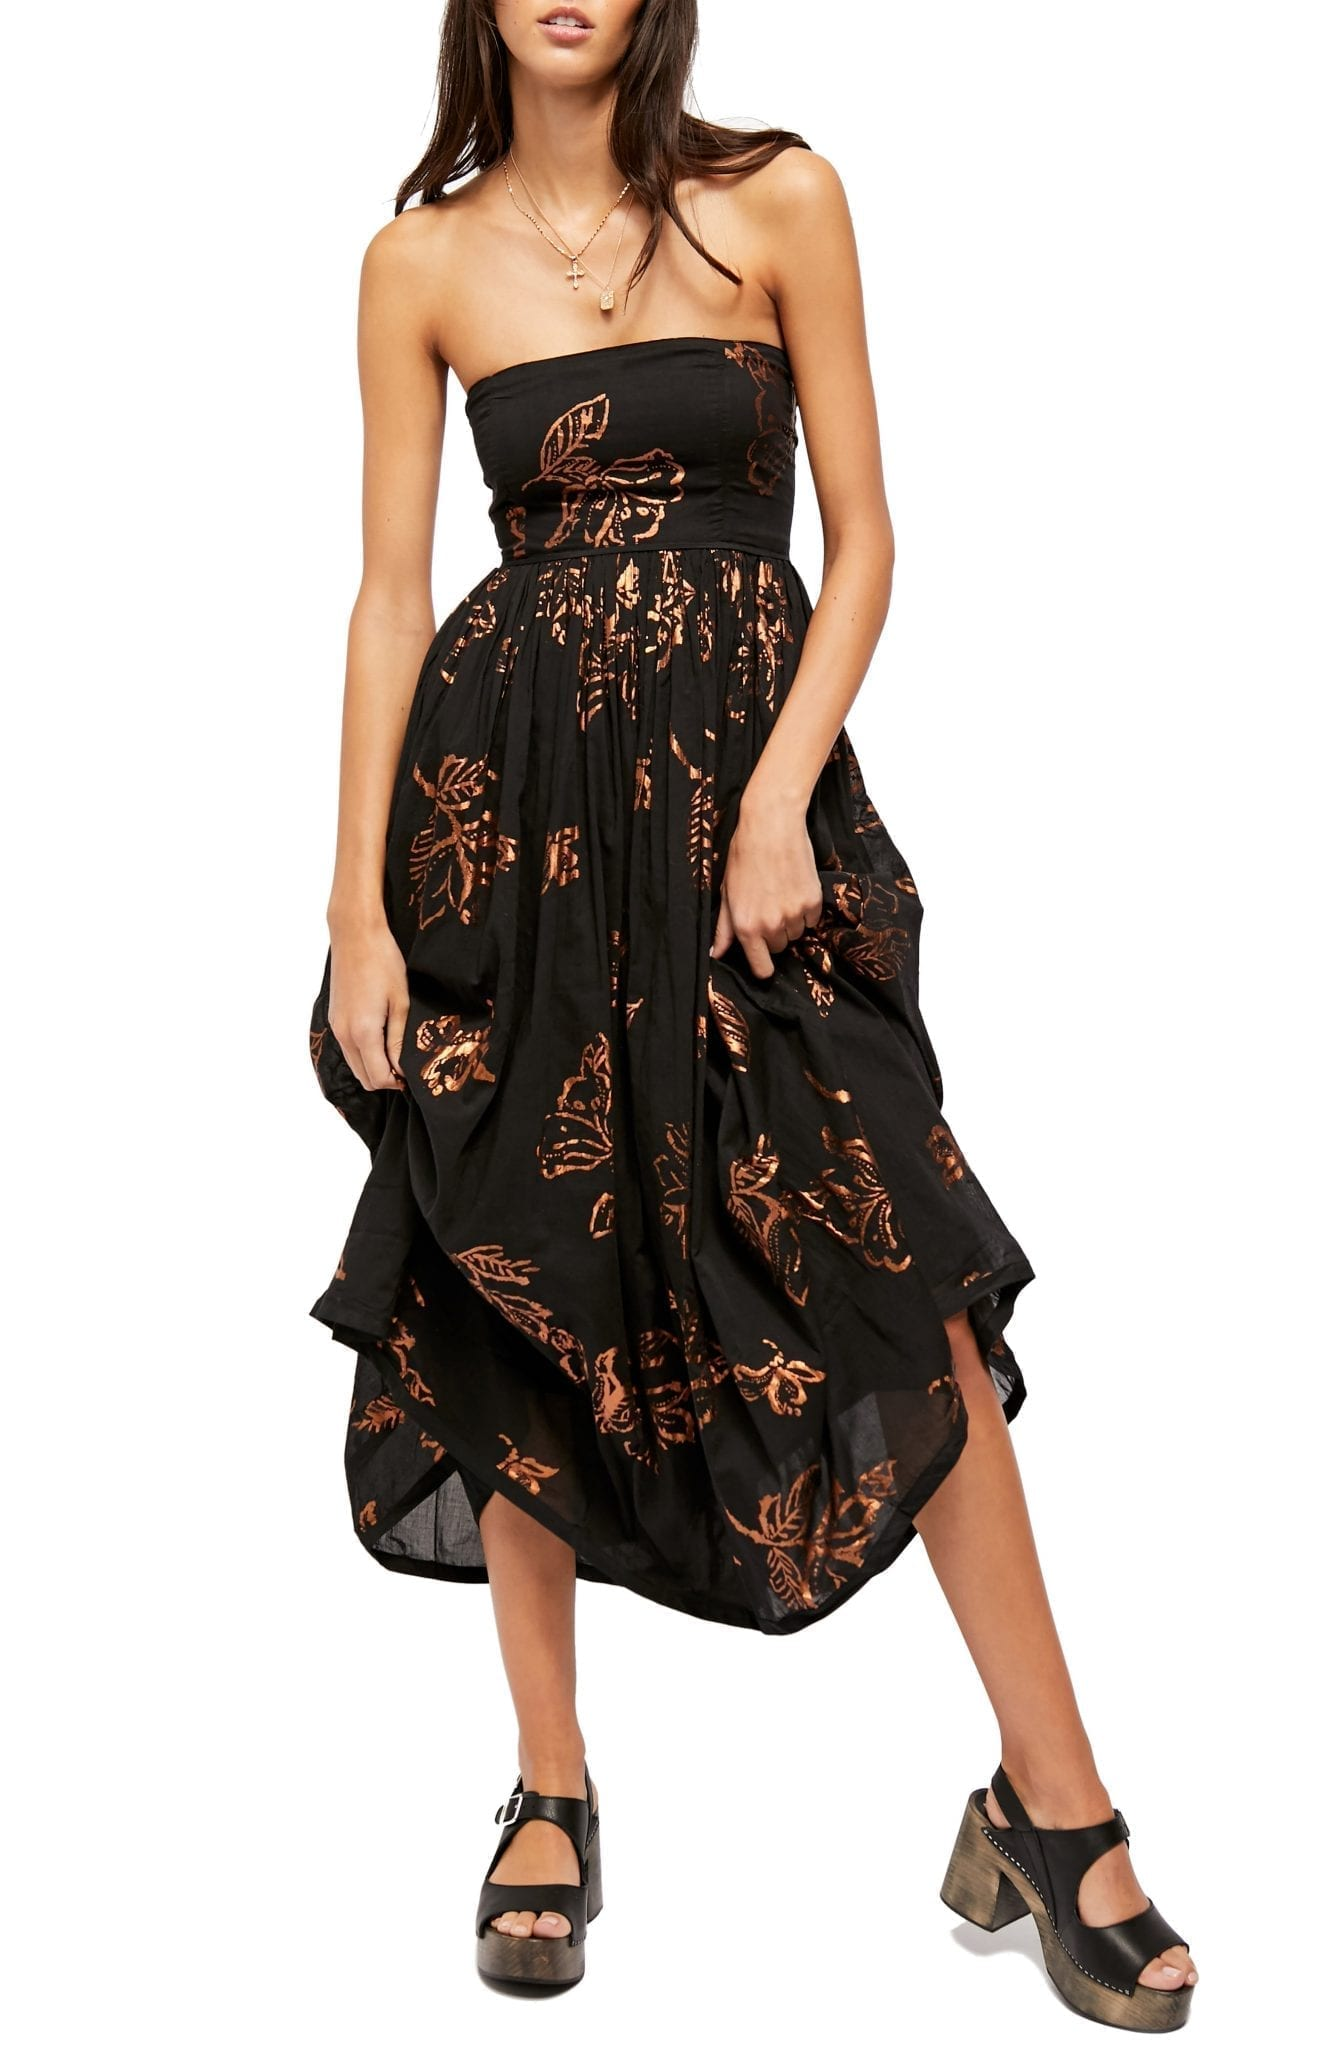 FREE PEOPLE Baja Babe Strapless Midi Dress